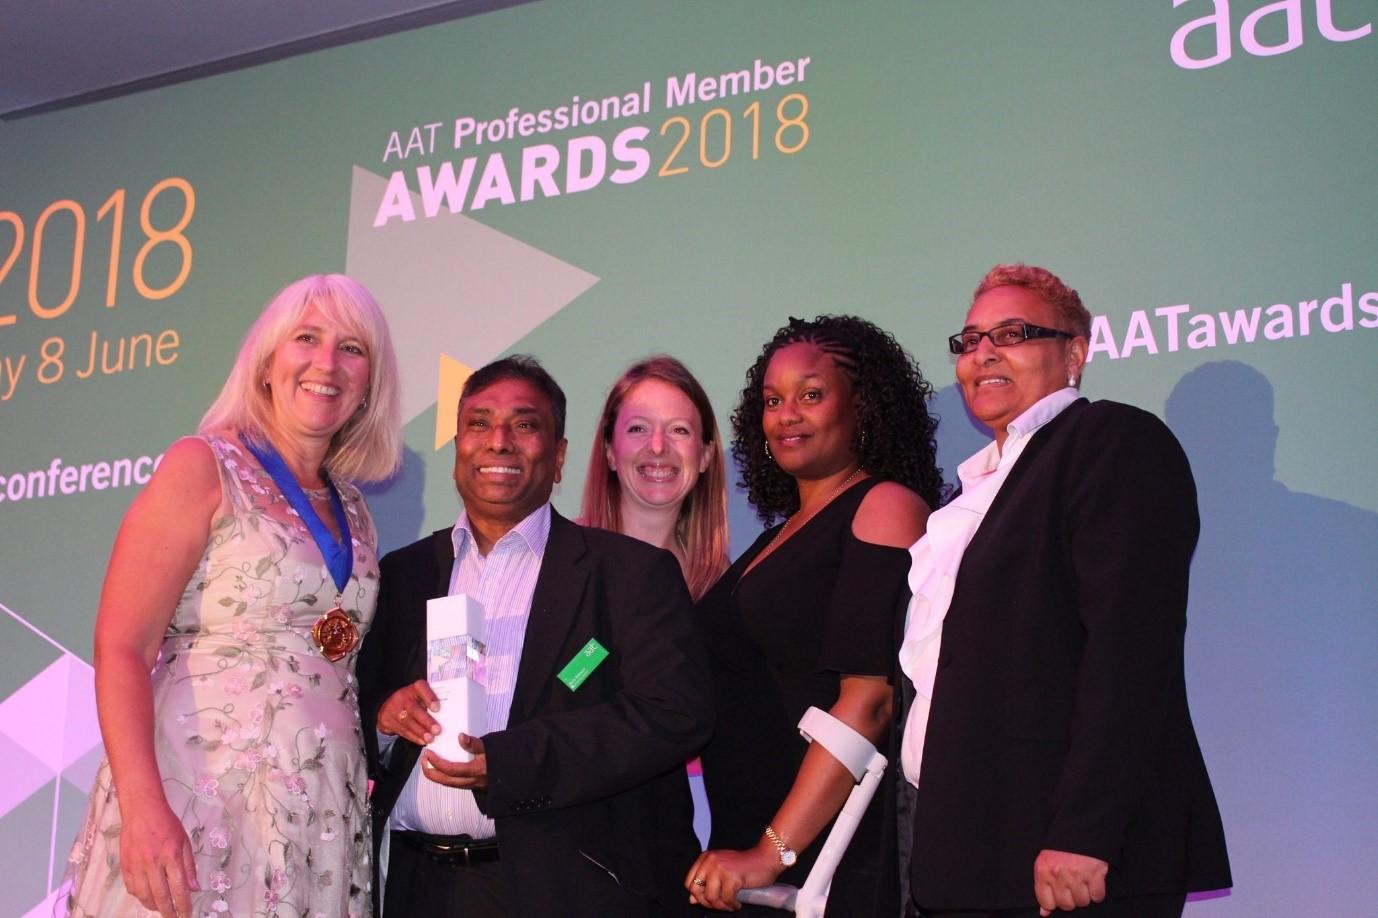 image: 2018 Professional Member awards